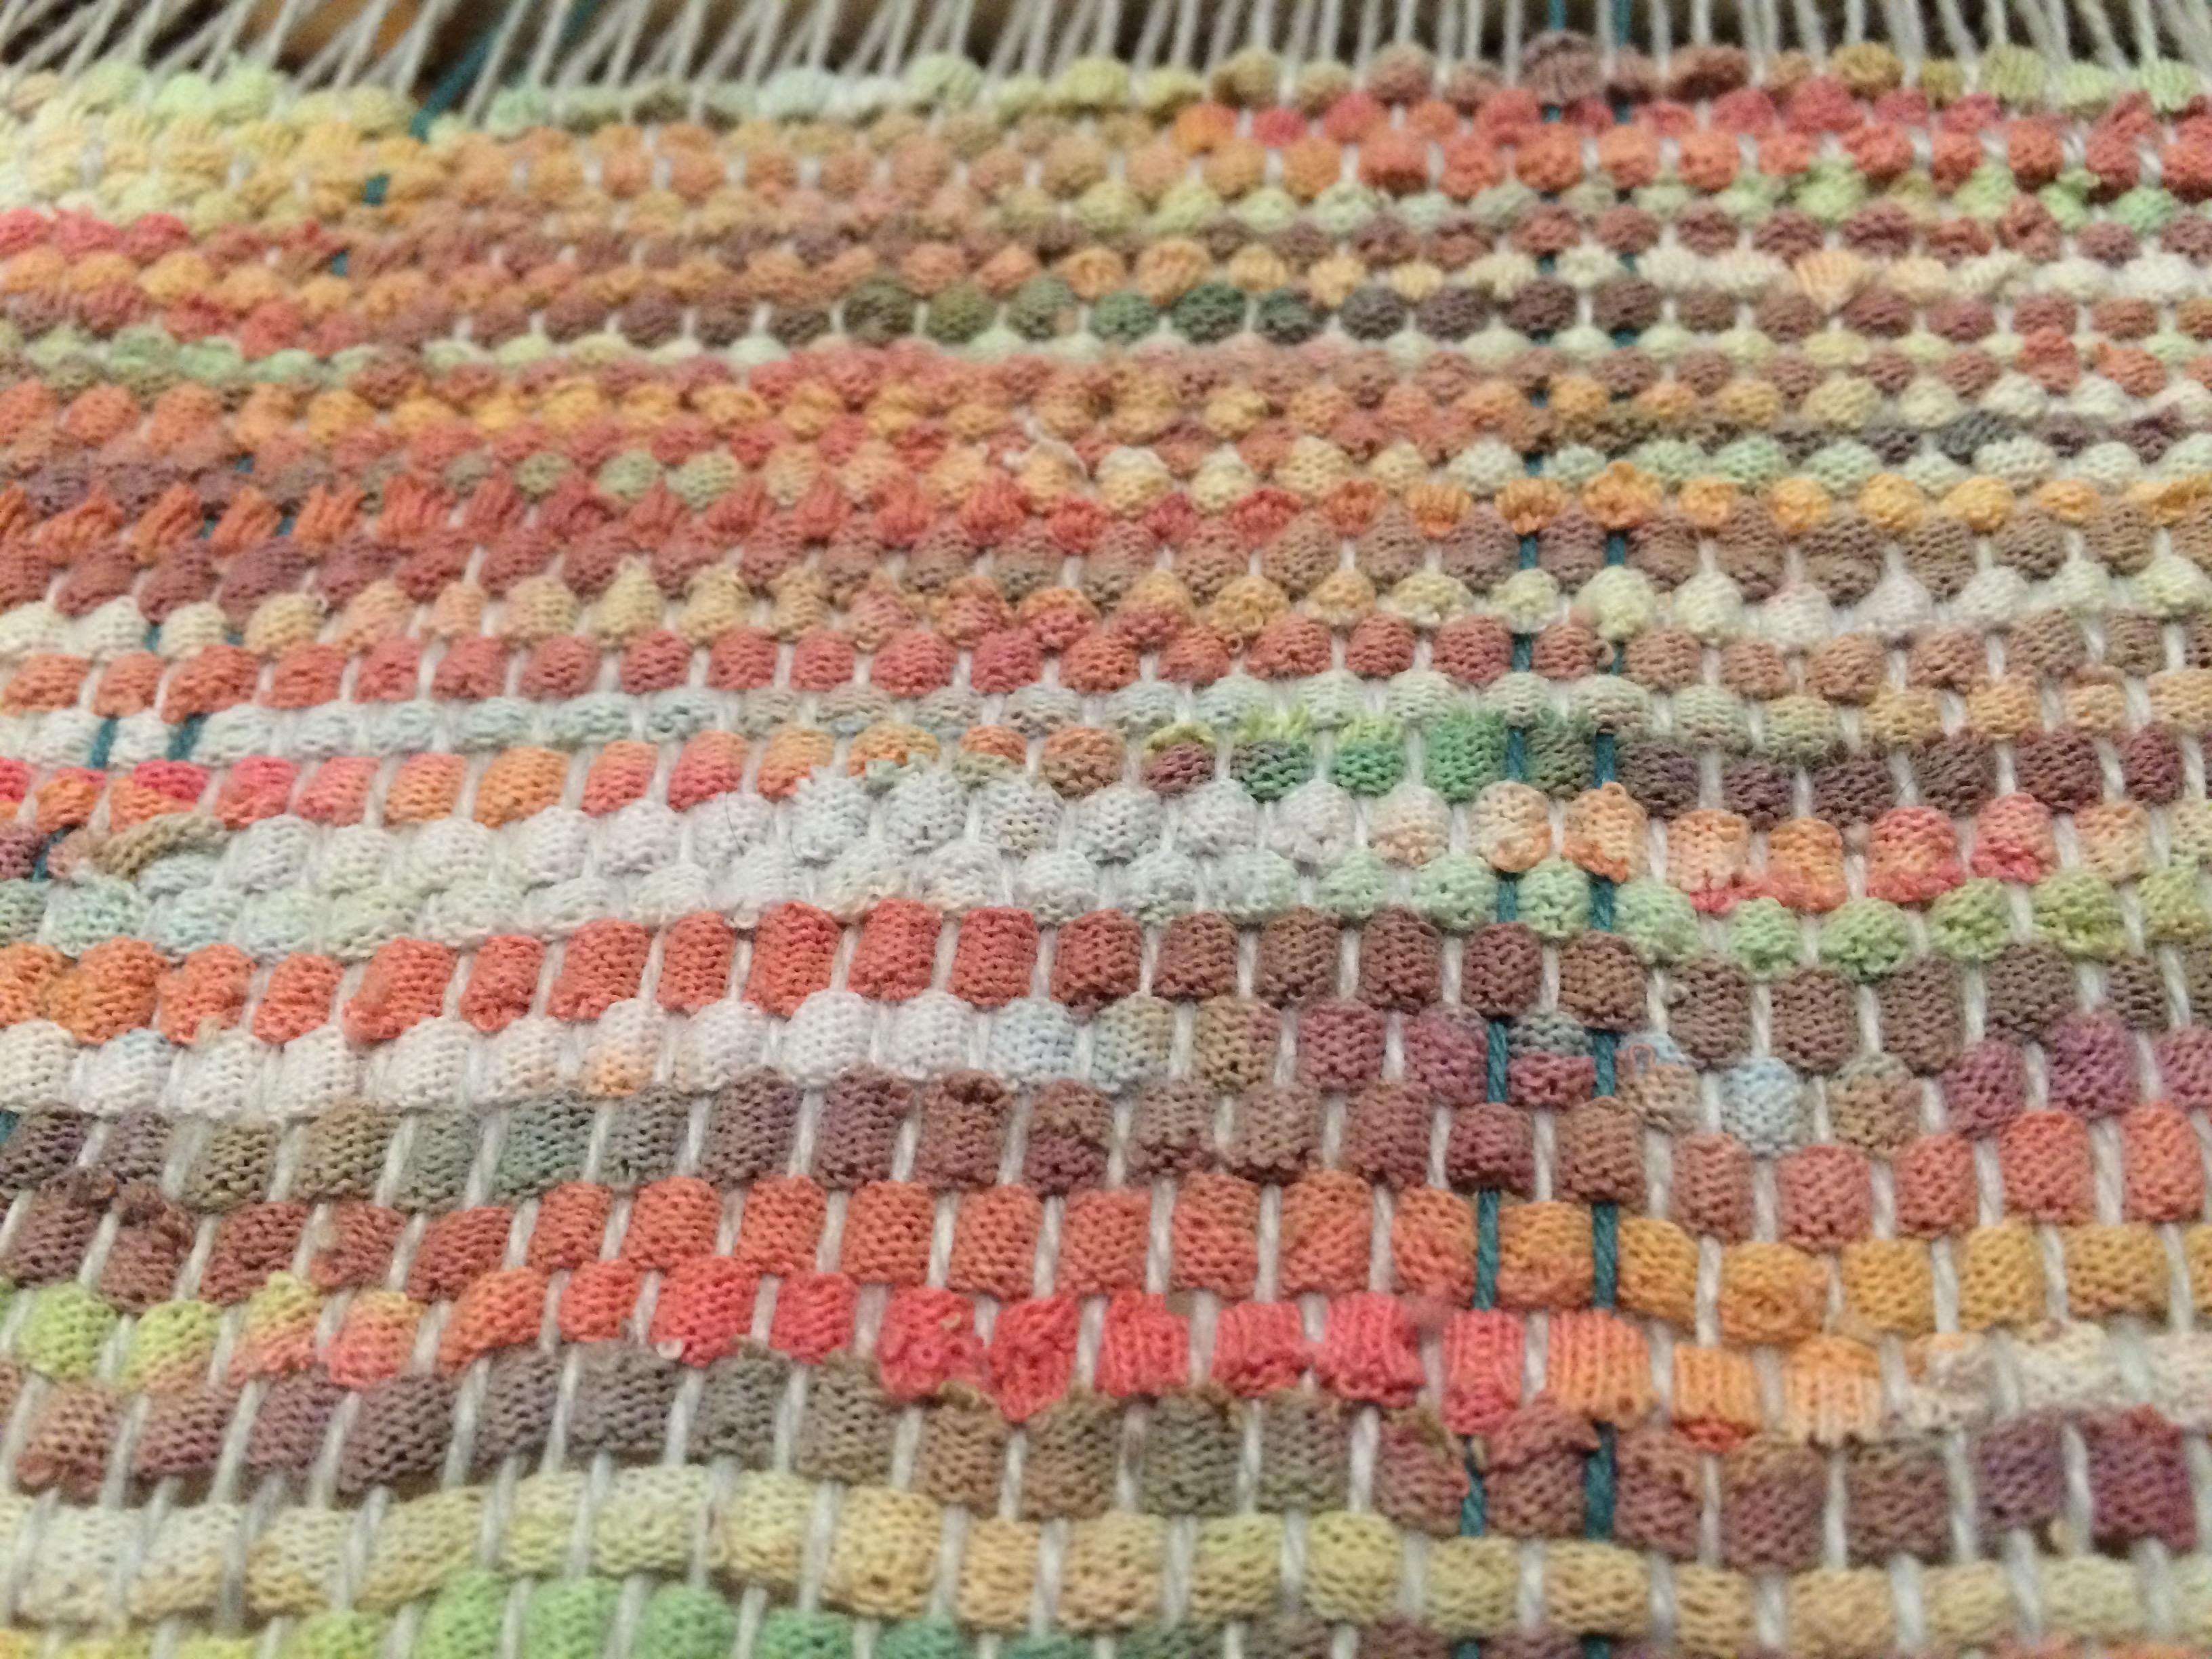 First weaving - tie dye t-shirt